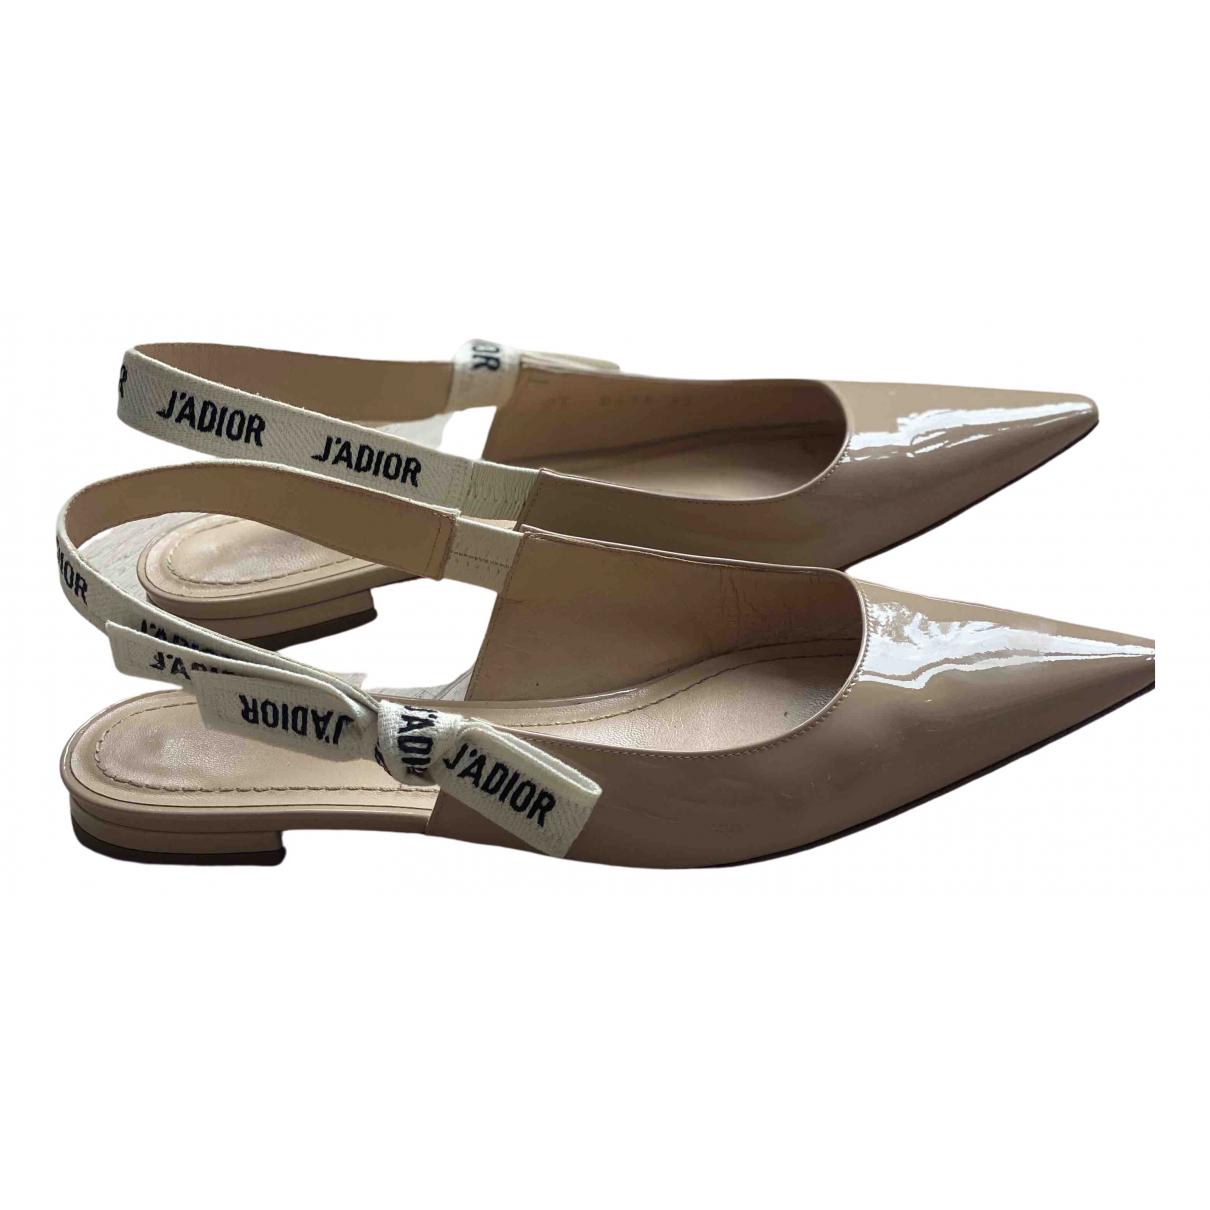 Dior J'adior Beige Patent leather Ballet flats for Women 37 EU